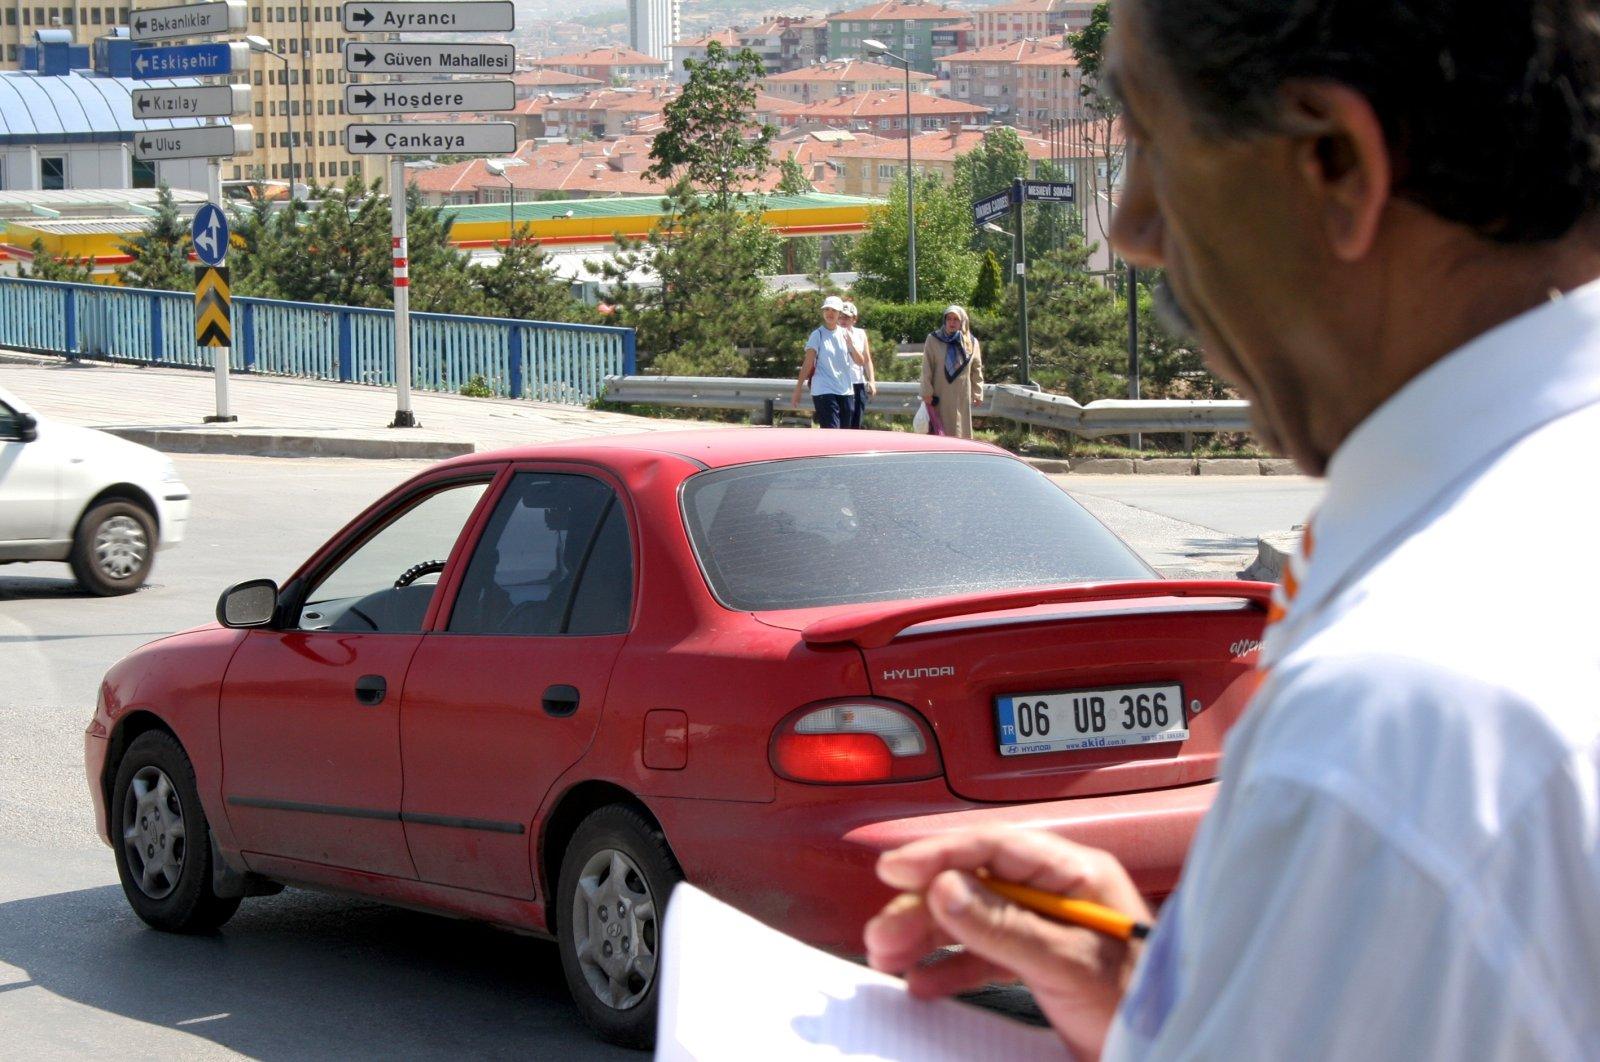 Ihsan Memiş, a volunteer inspector, checks cars for violations in the capital, Ankara, Turkey, June 21, 2006. (AA PHOTO)